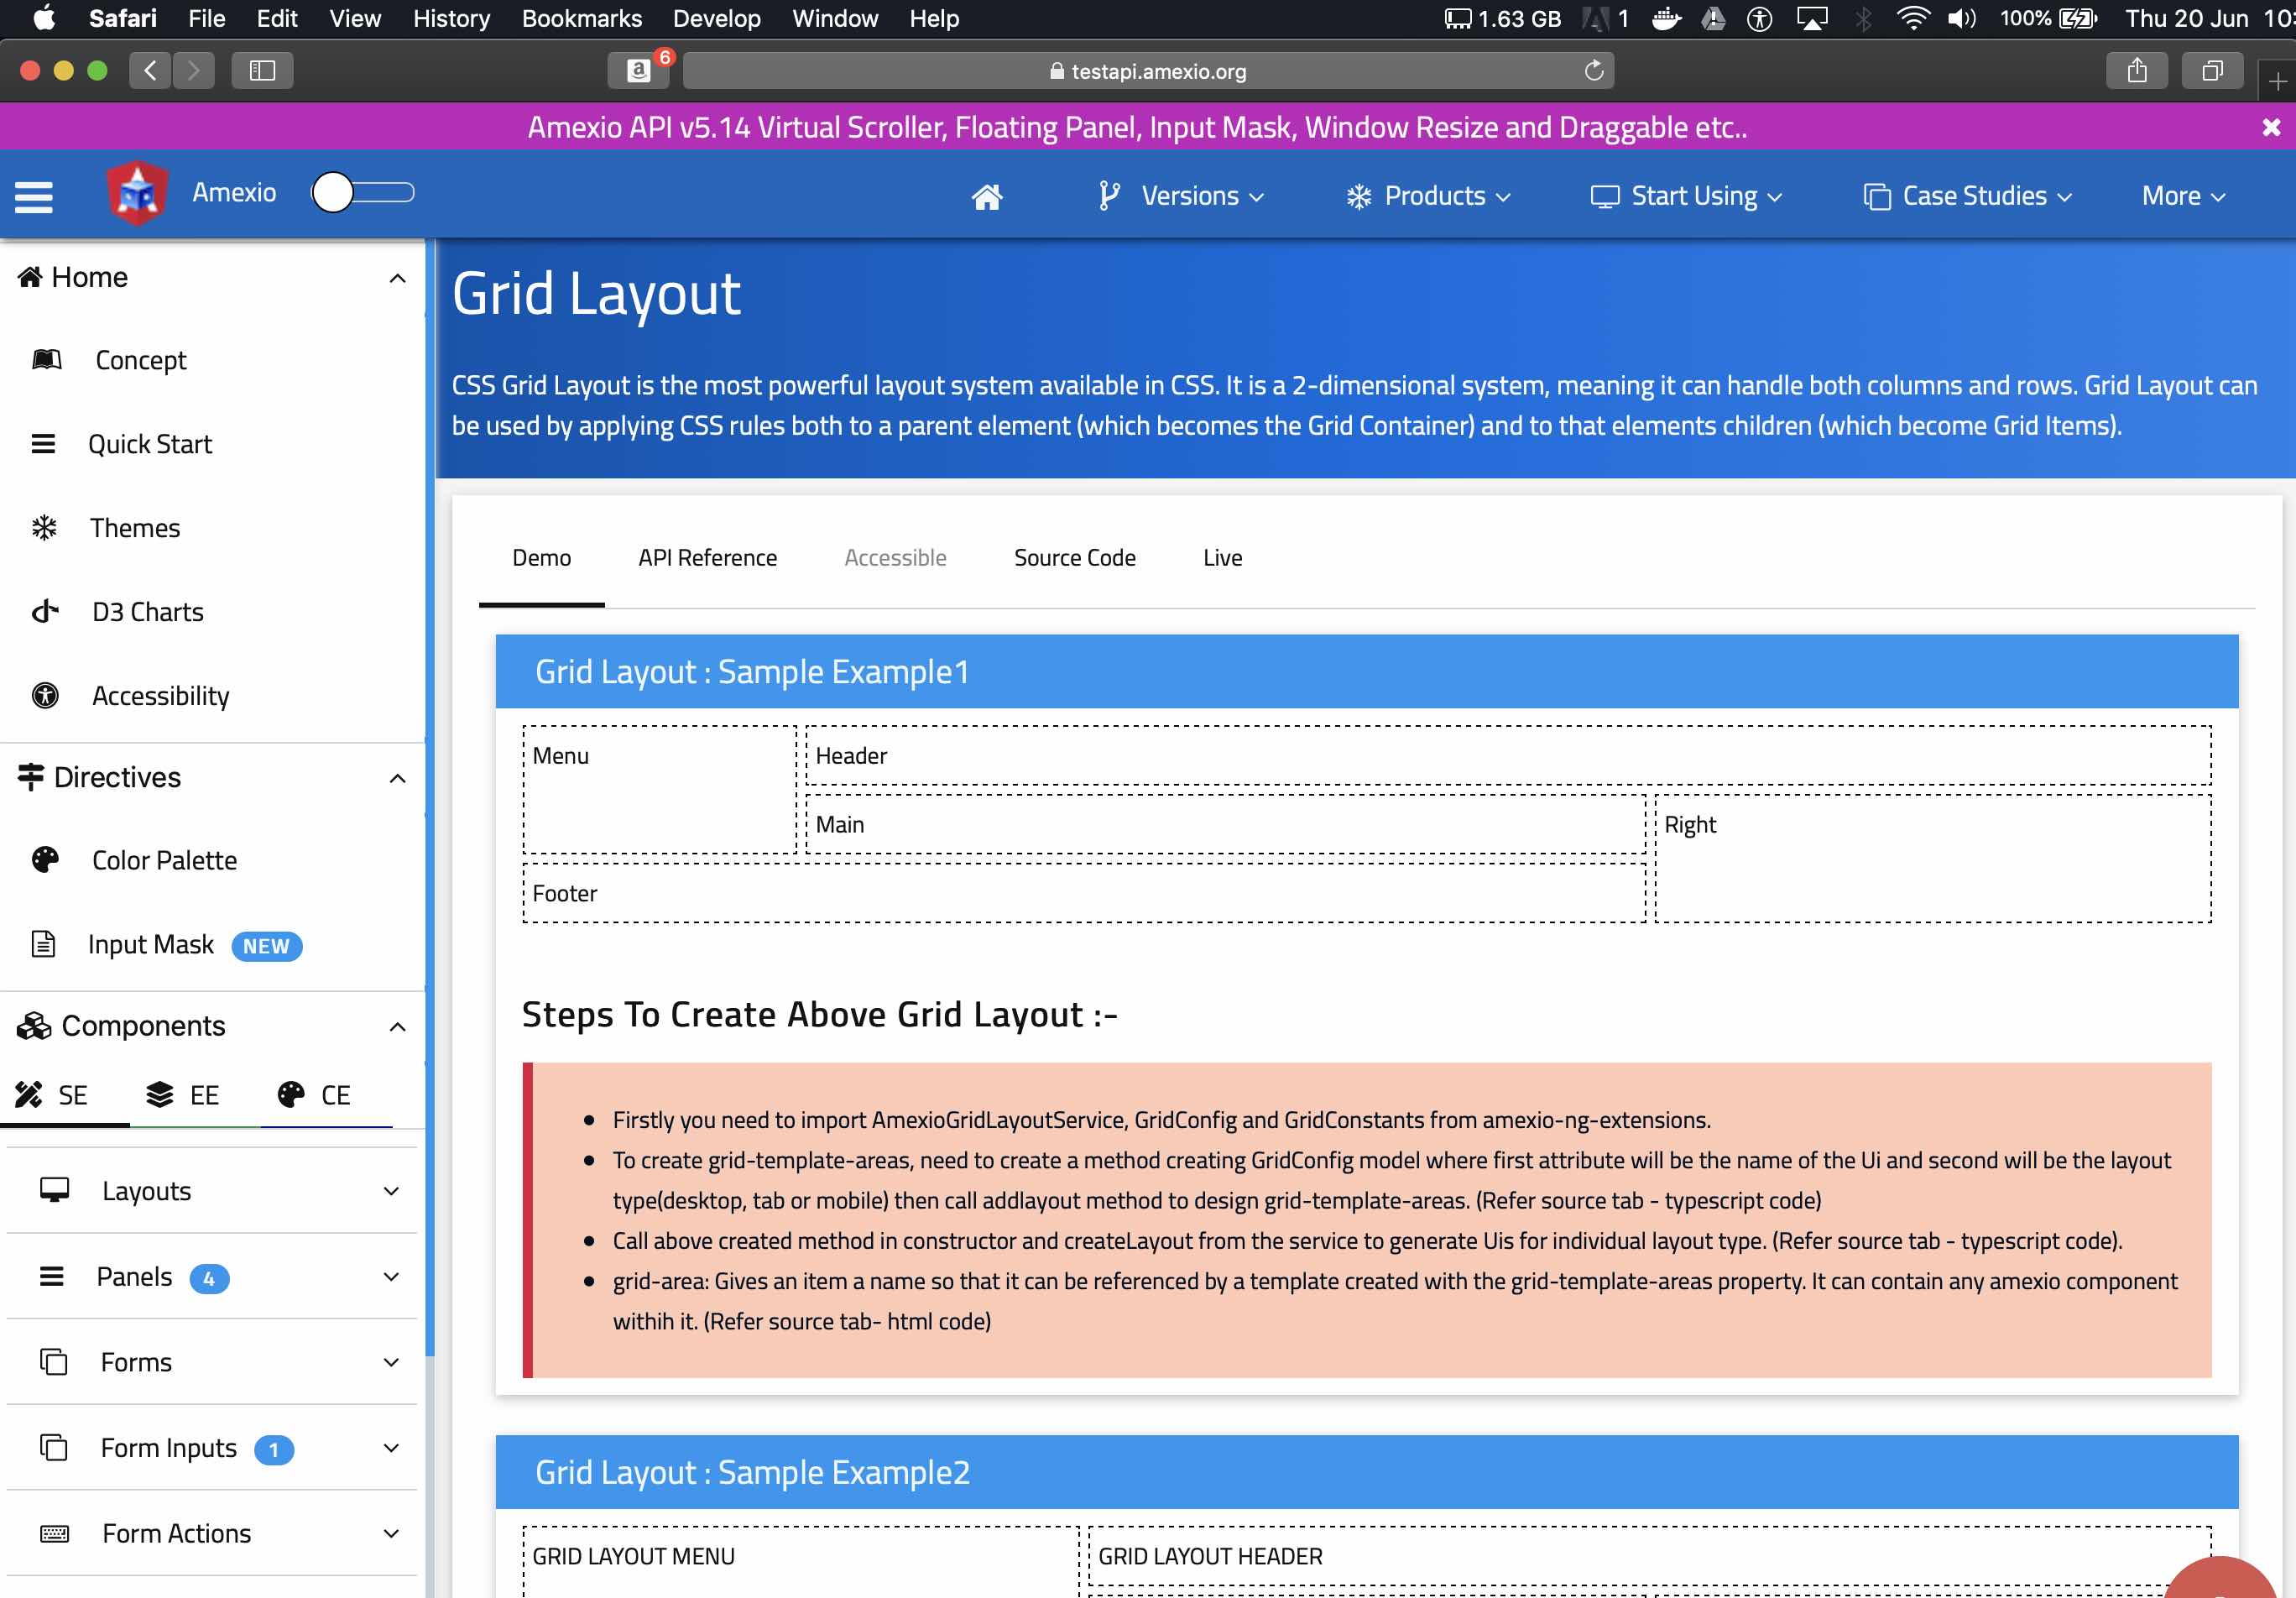 Amexio-fix-Grid-Layout-Safari